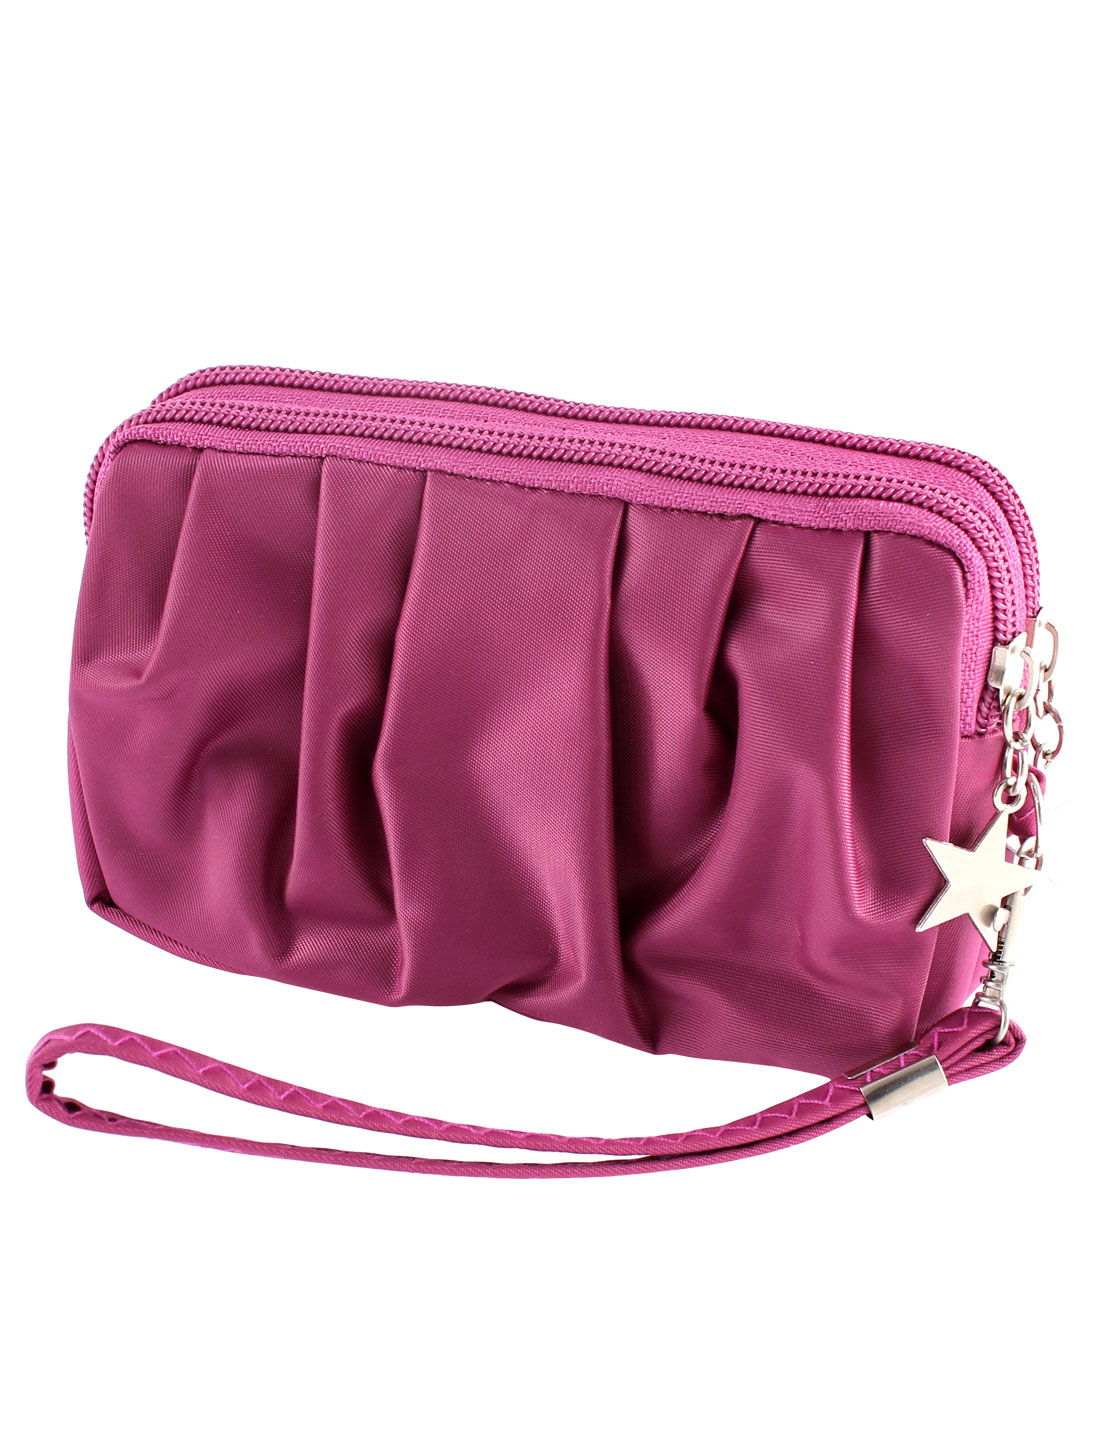 Woman Zipper Closure Wristlet Cash Purse Coin Cards Bag Handbag Wallet Fuchsia